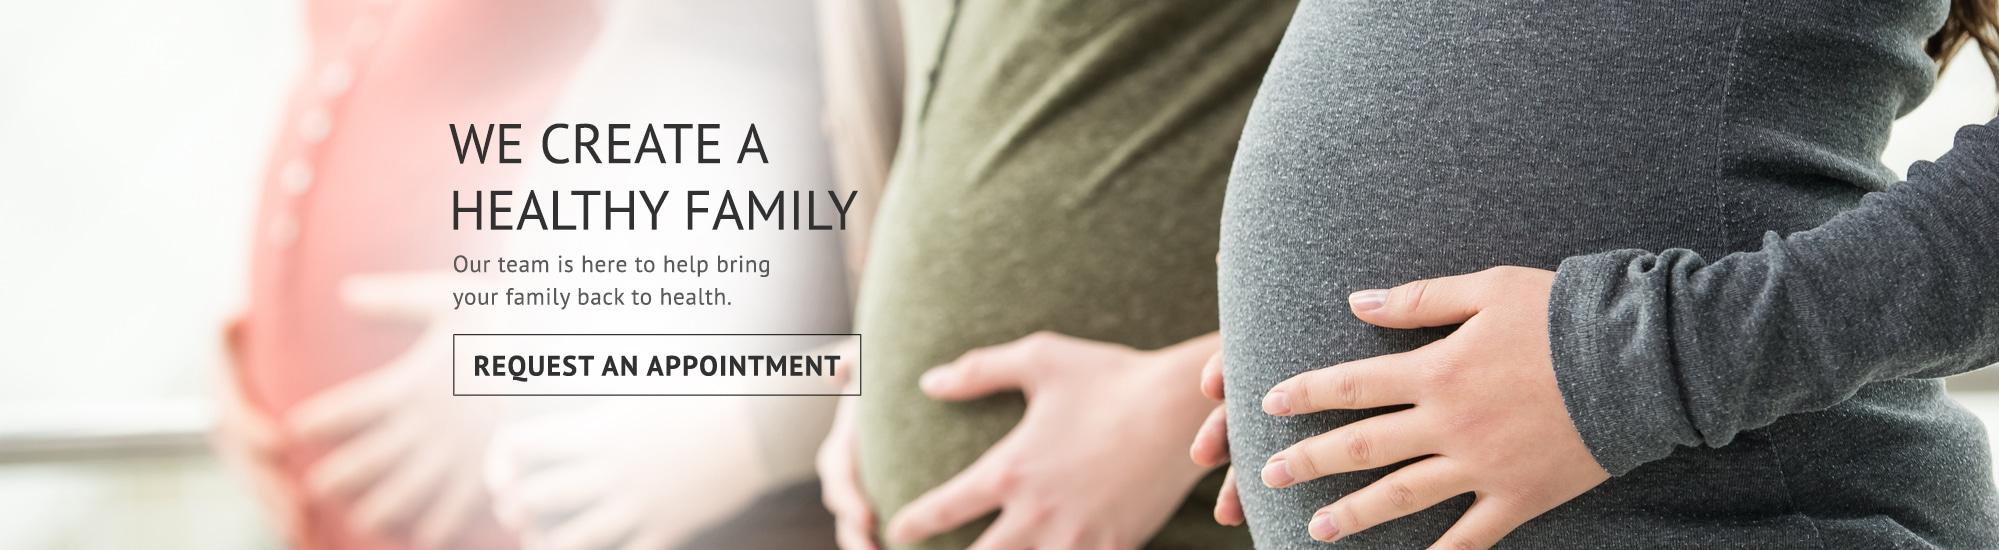 Pregnancy Slider